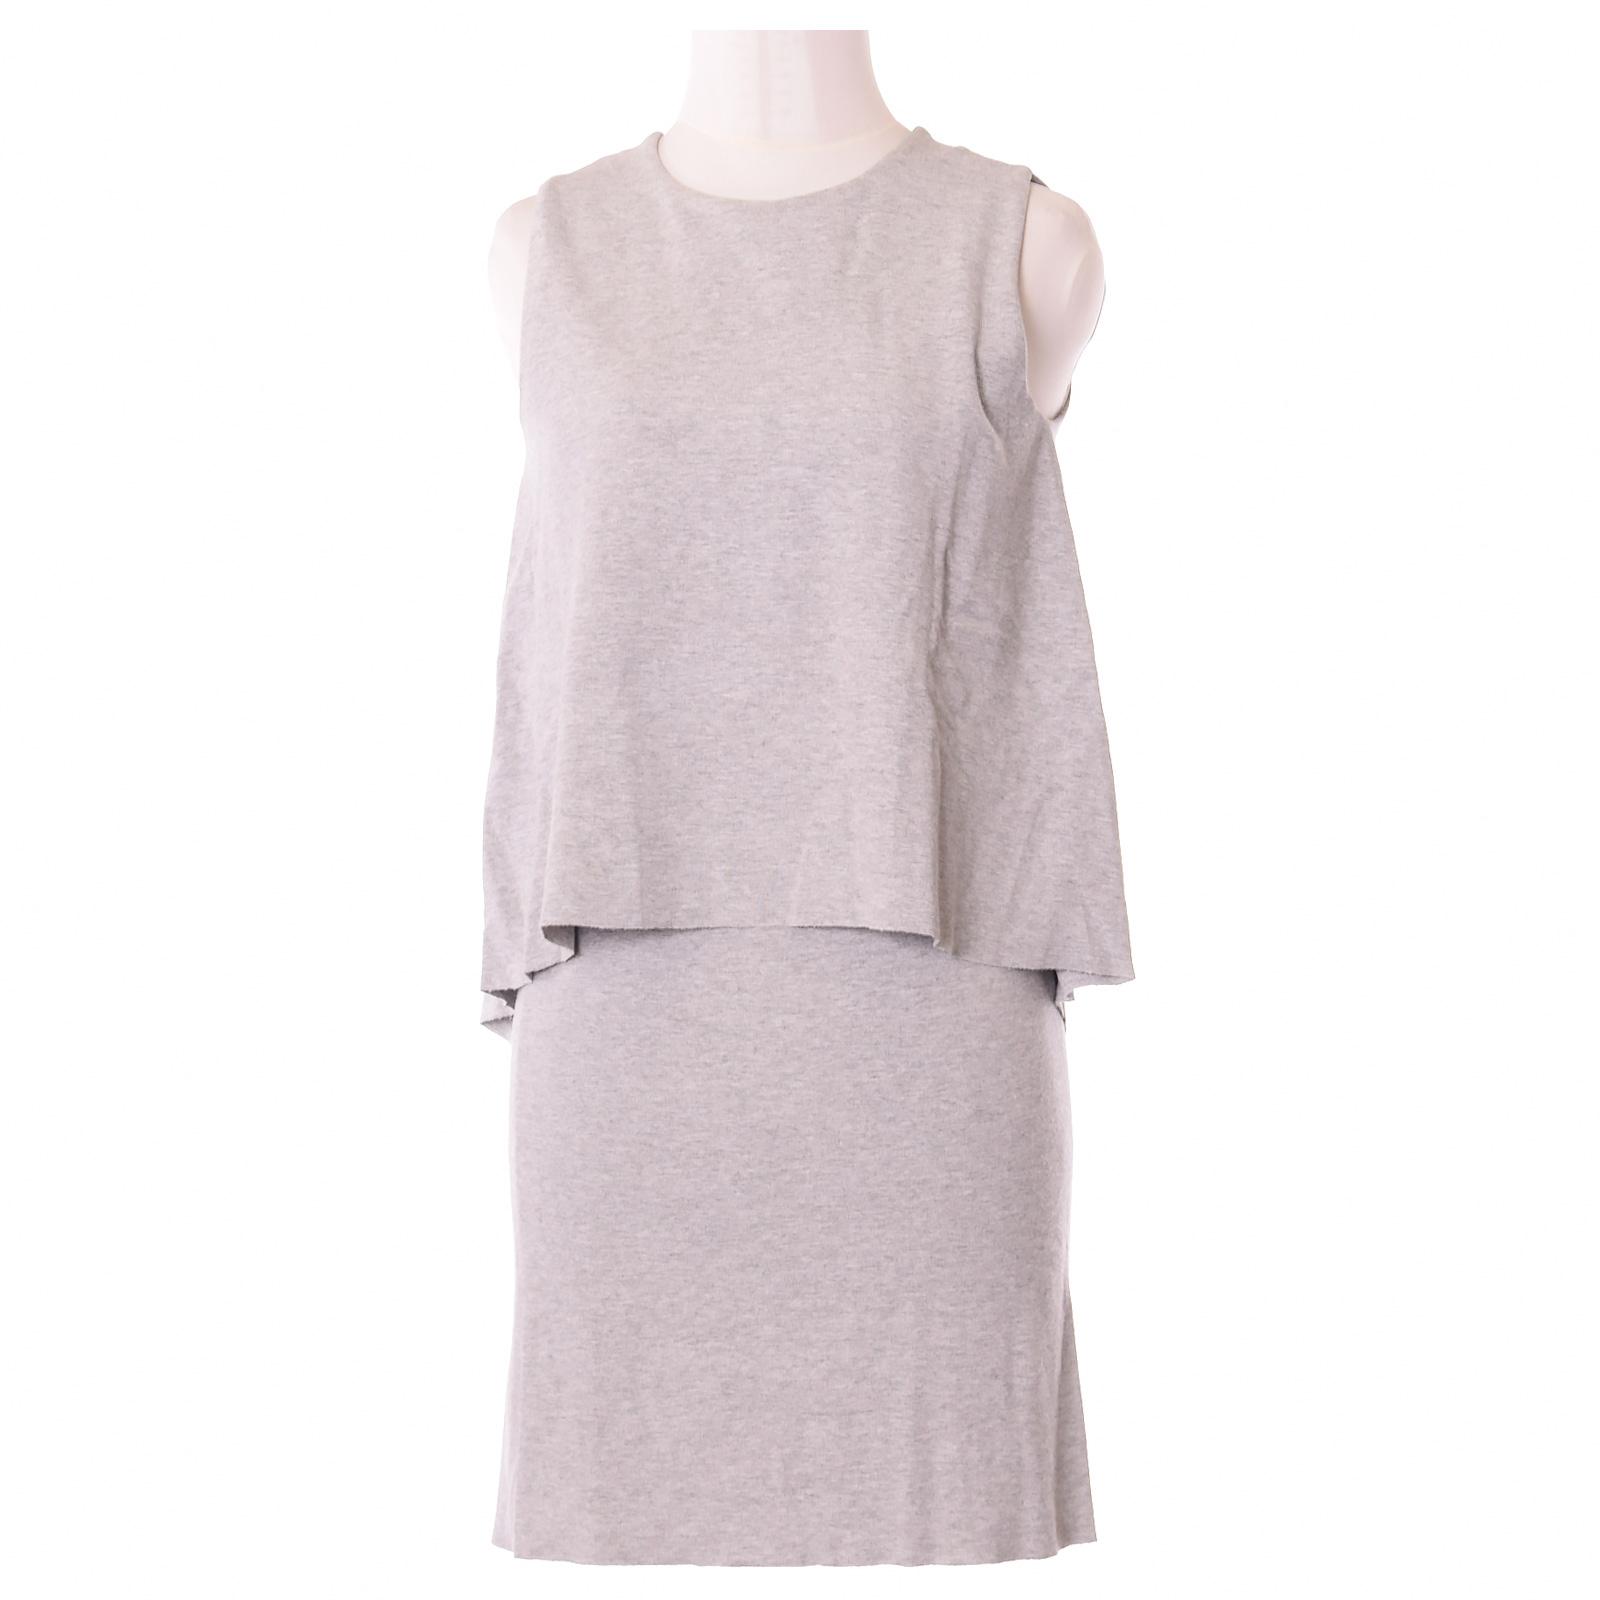 details zu cos damen minikleid kleid mini dress gr.xs (de 34) casual grau,  59327